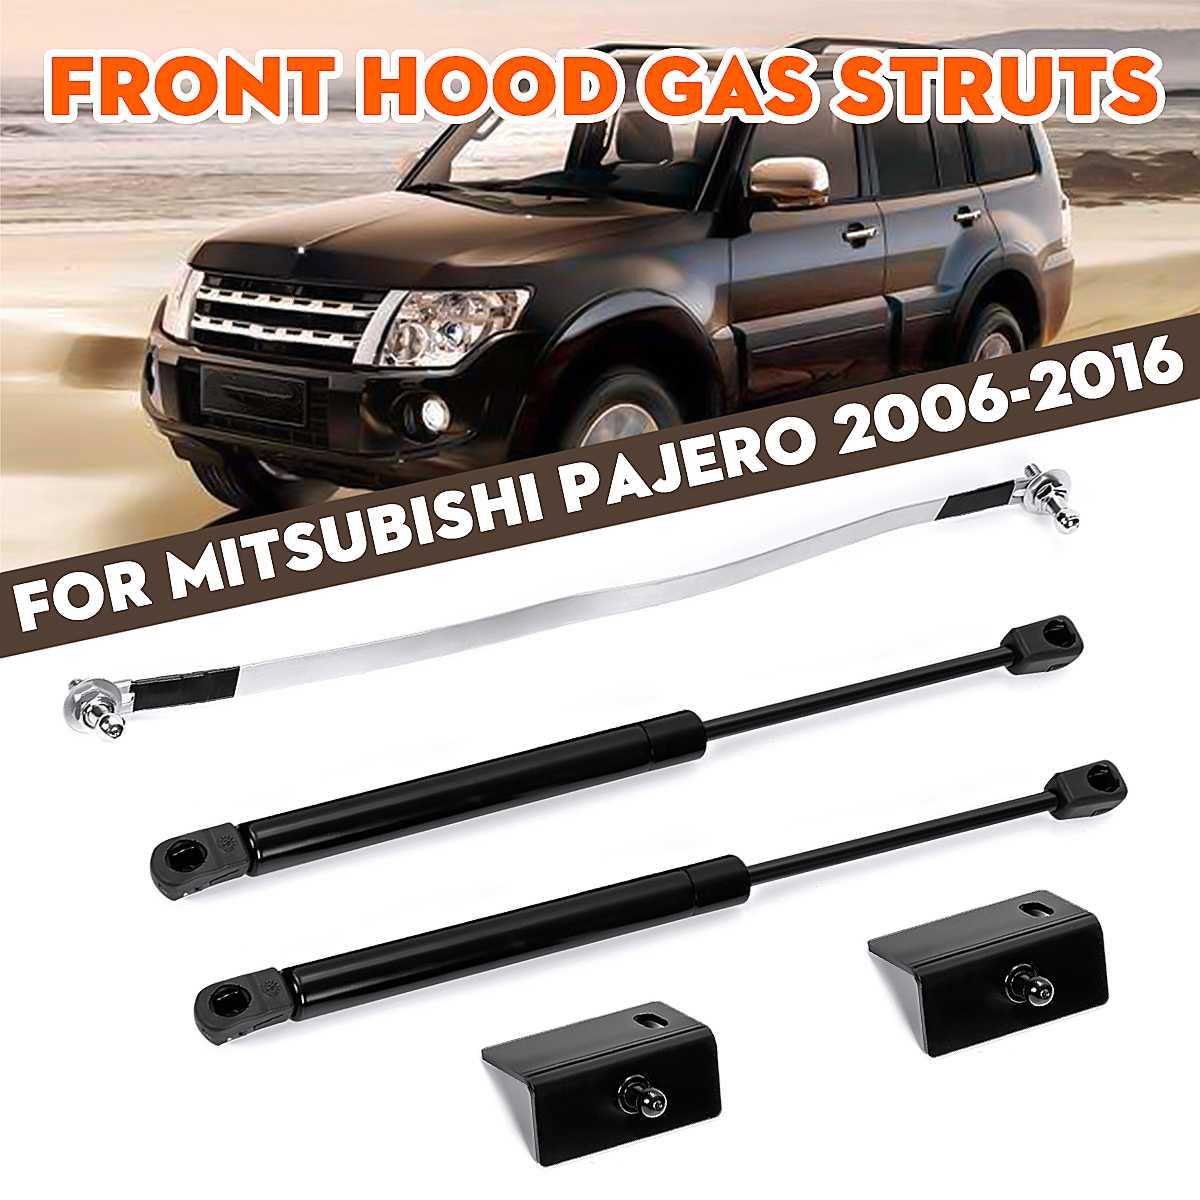 Car Front Engine Cover Hood Shock Lift Strut Struts Bar Support Props Rod Arm Gas Spring Bracket For Mitsubishi Pajero 2006-2016